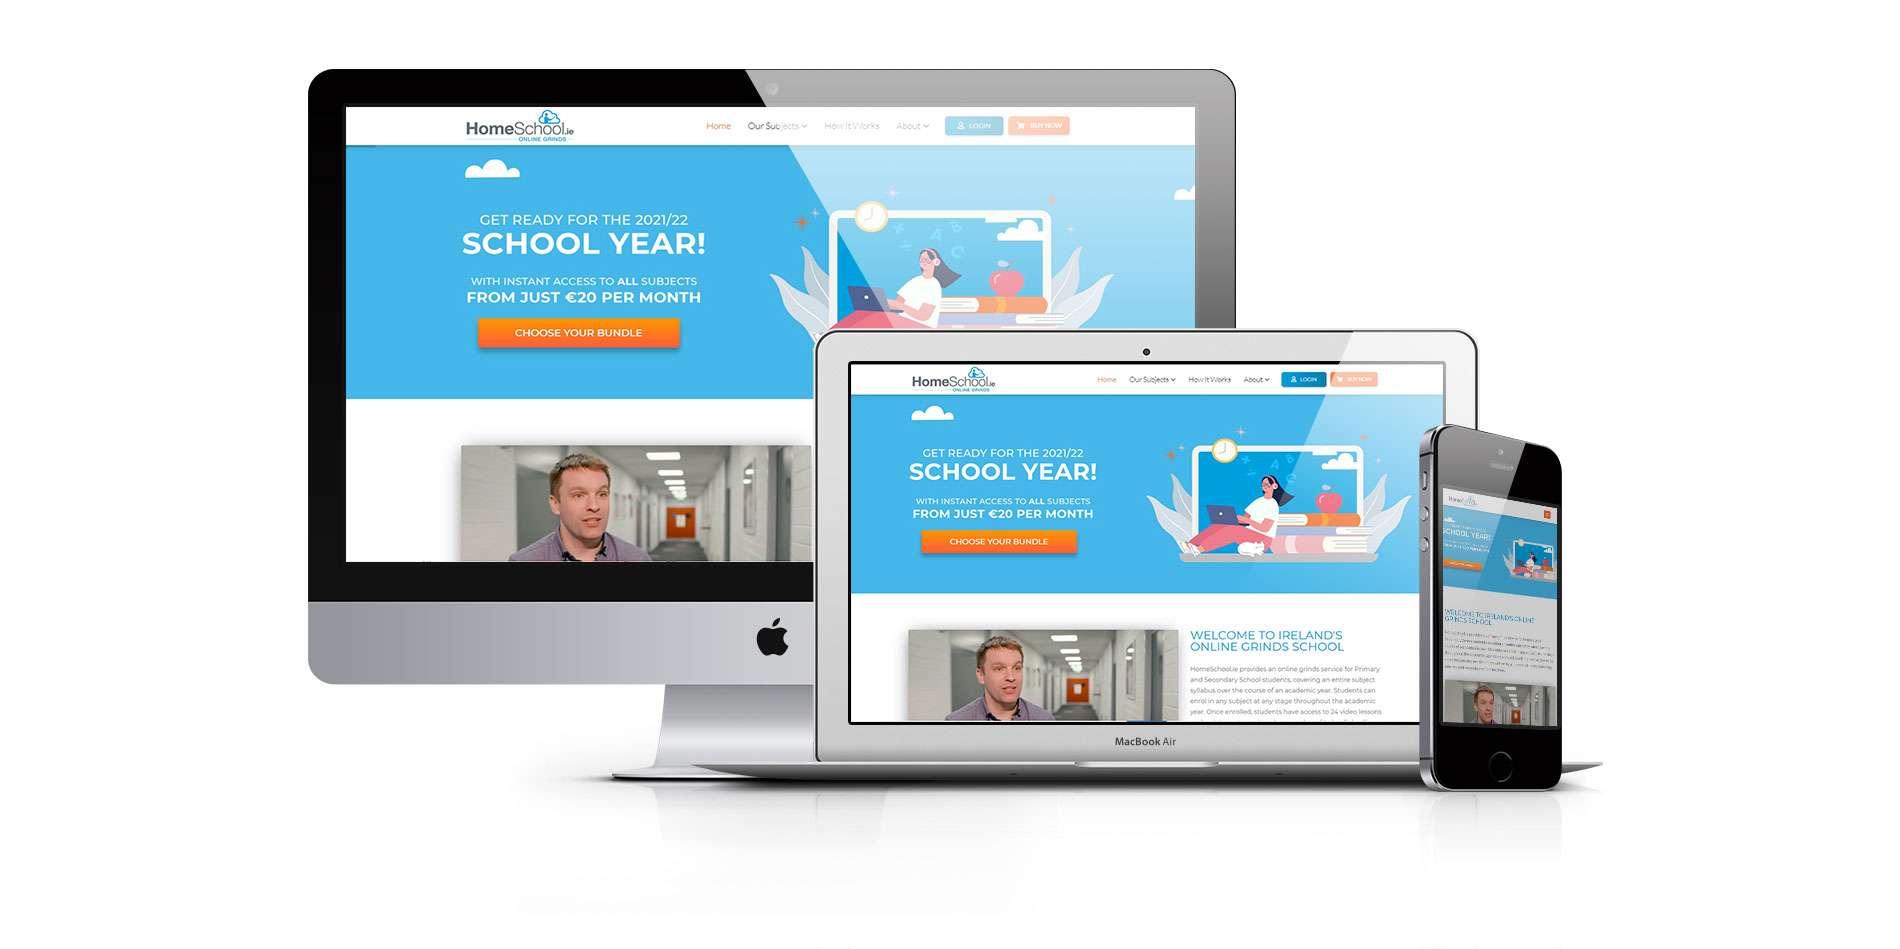 website design Dublin of homeschool ireland